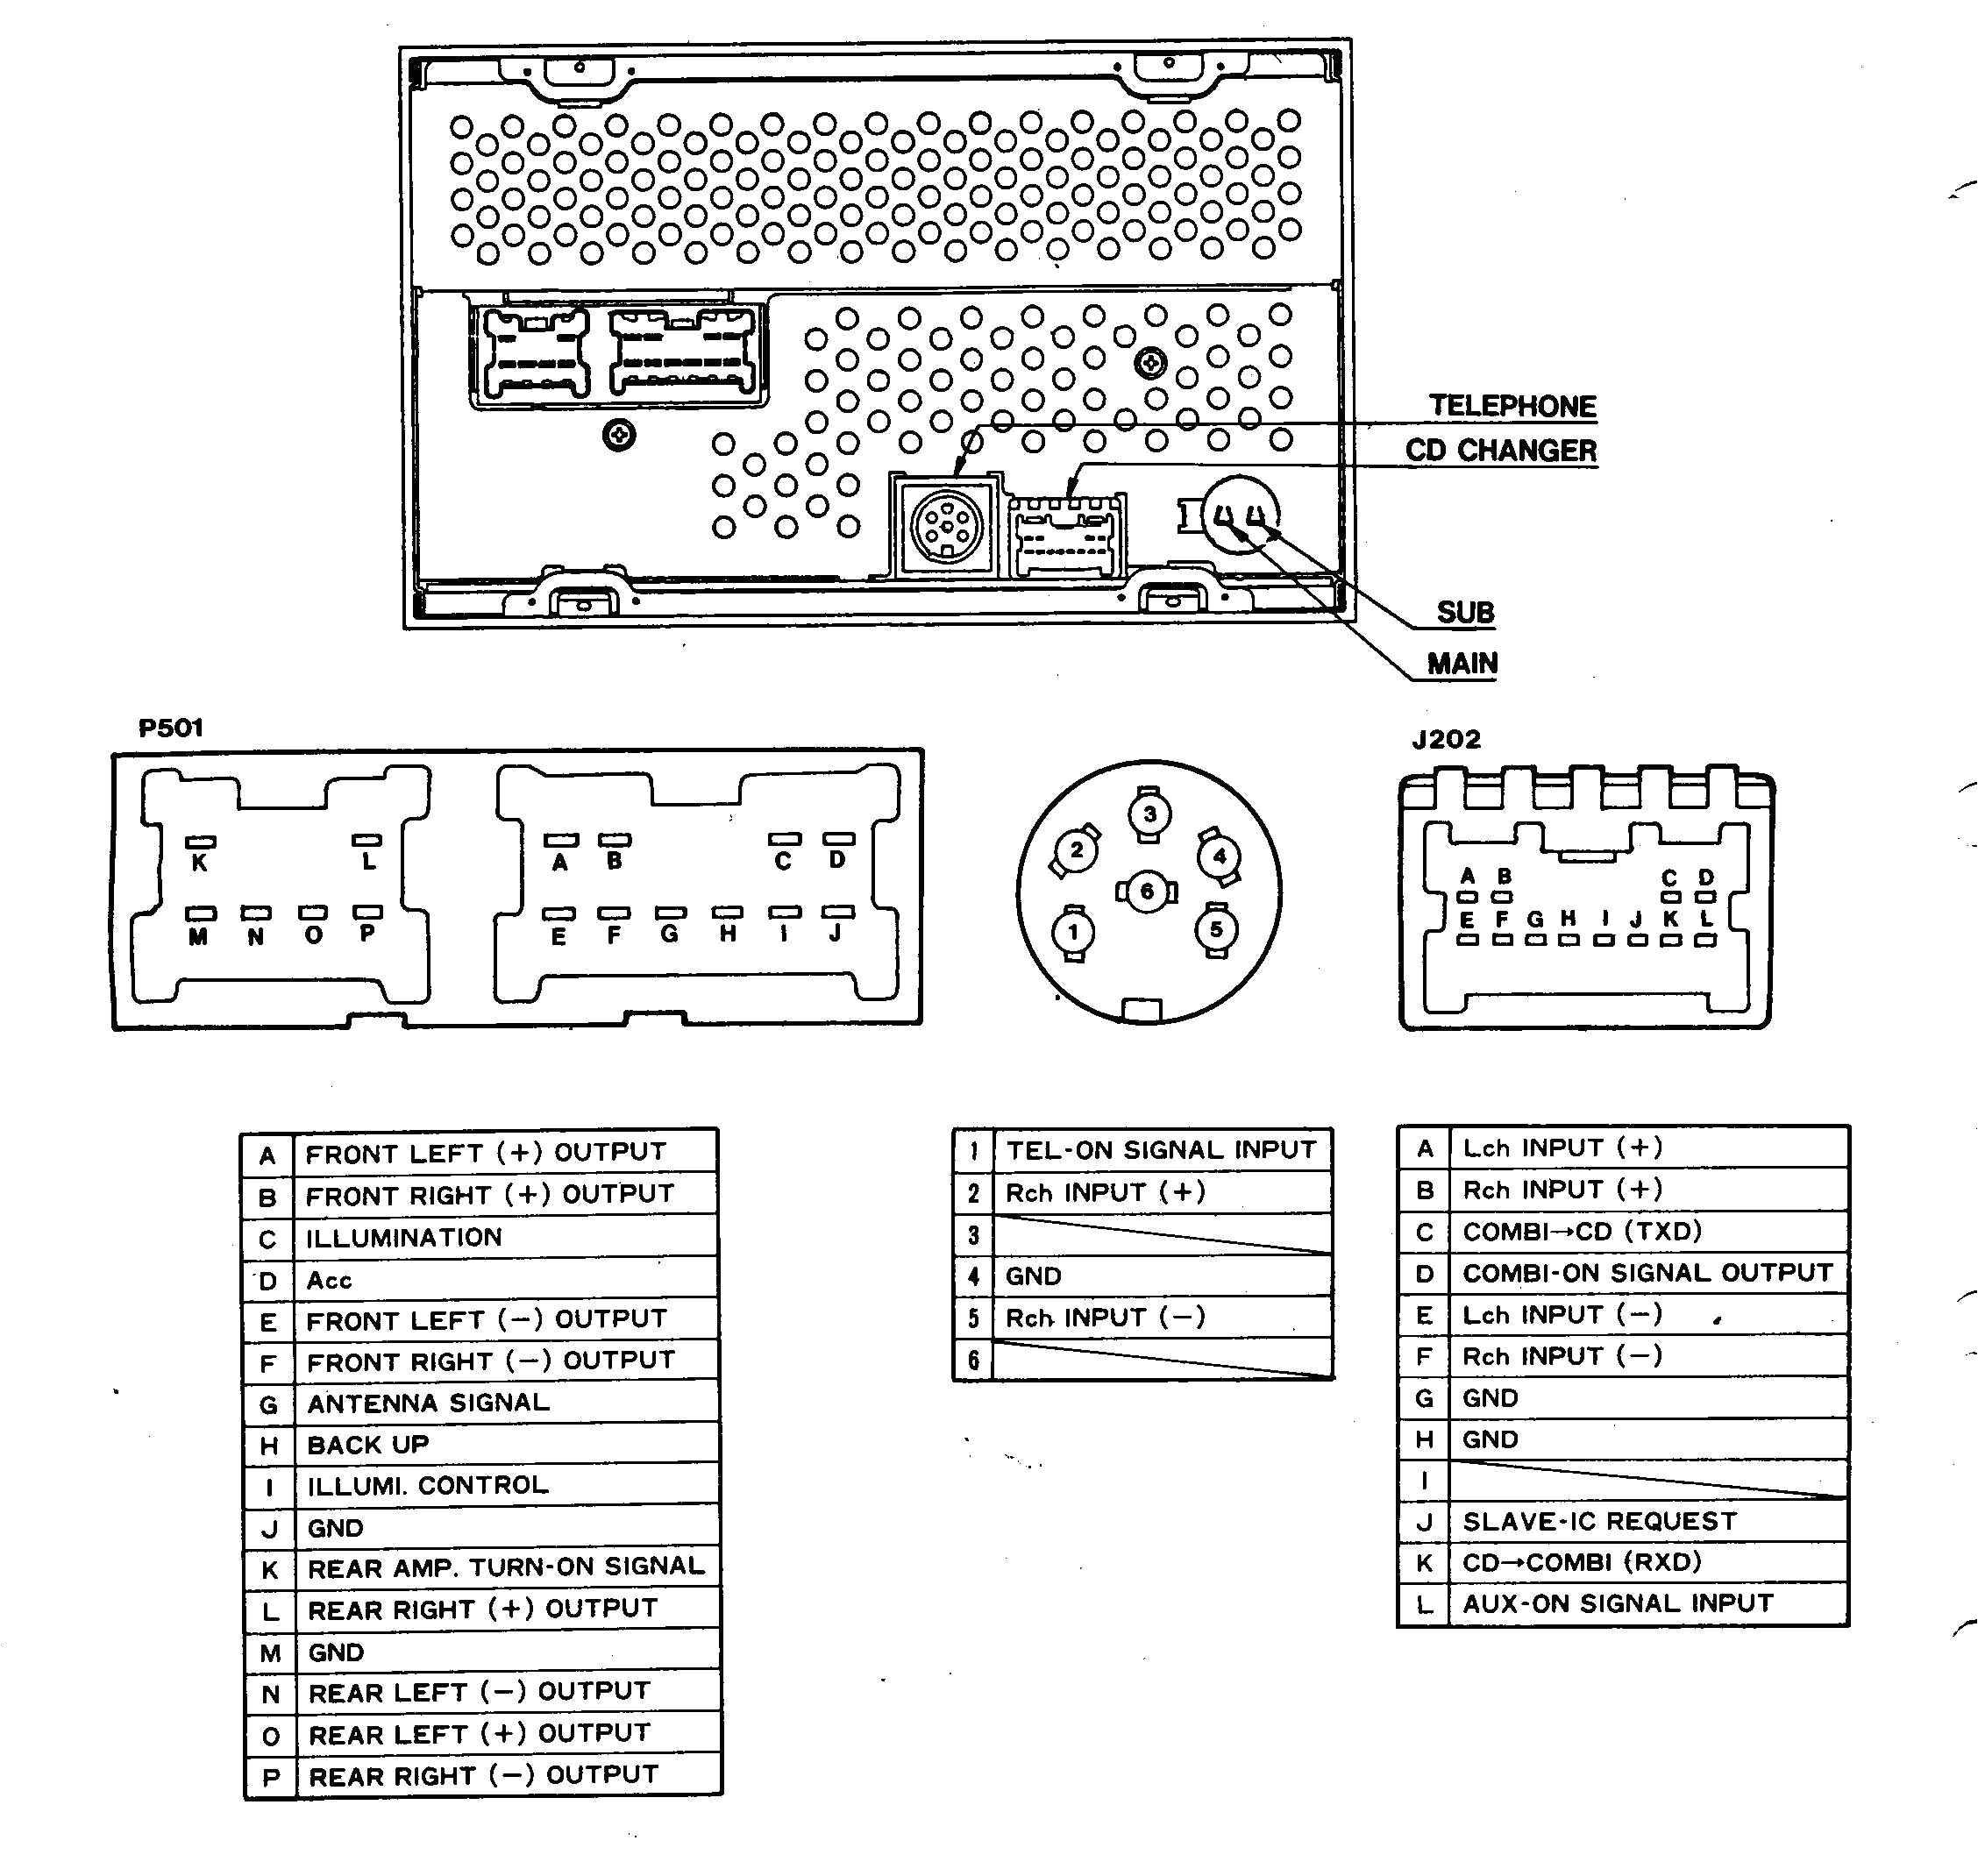 Lexus Rx330 Radio Wiring Diagram 350z Stereo Wiring Diagram Wiring Library